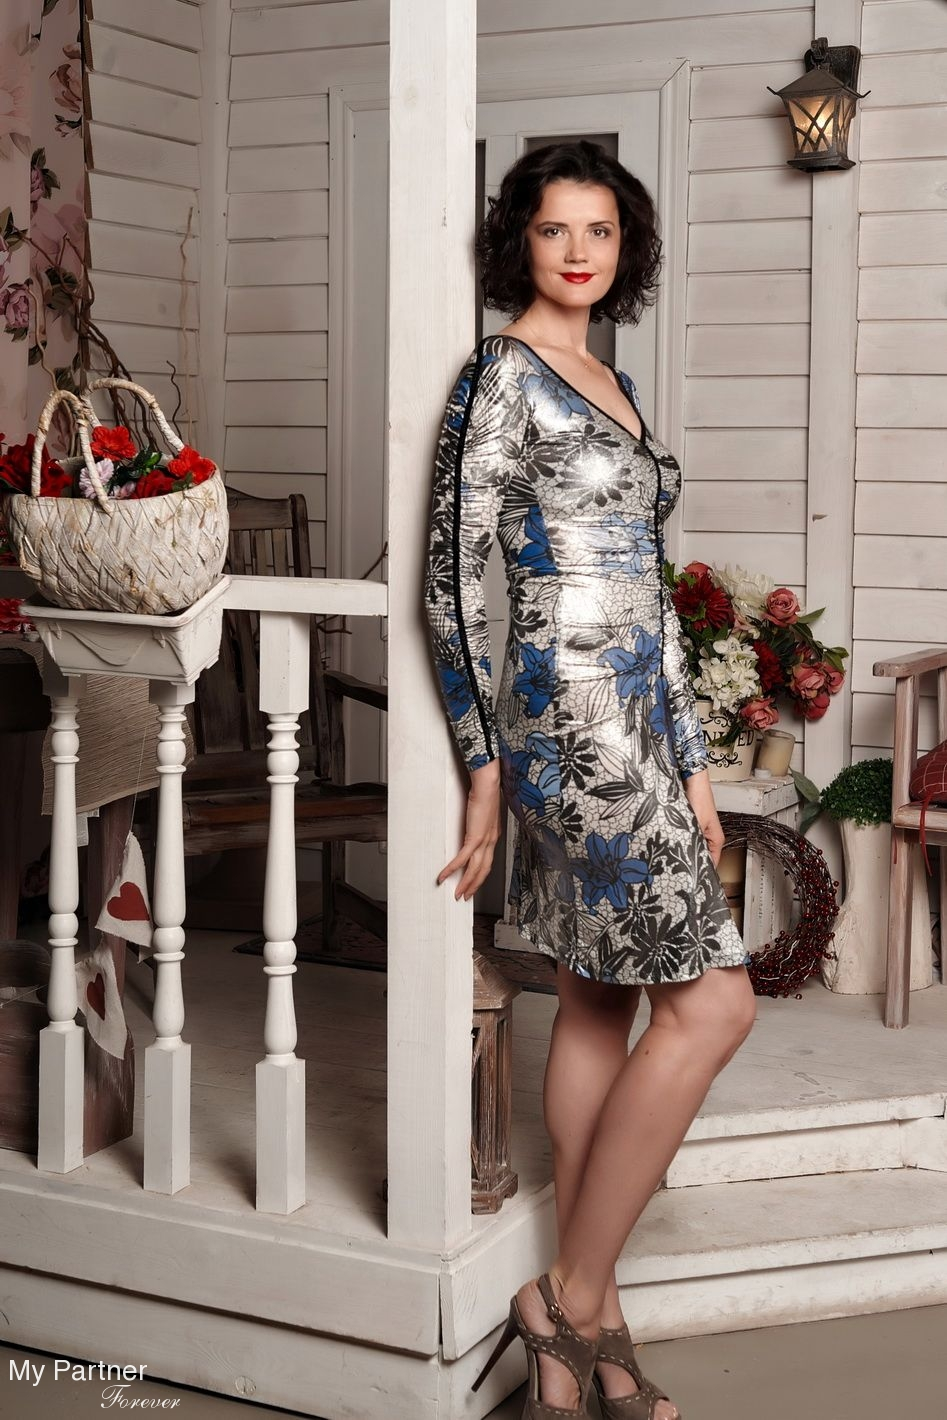 Charming Ukrainian Lady Elena from Kharkov, Ukraine